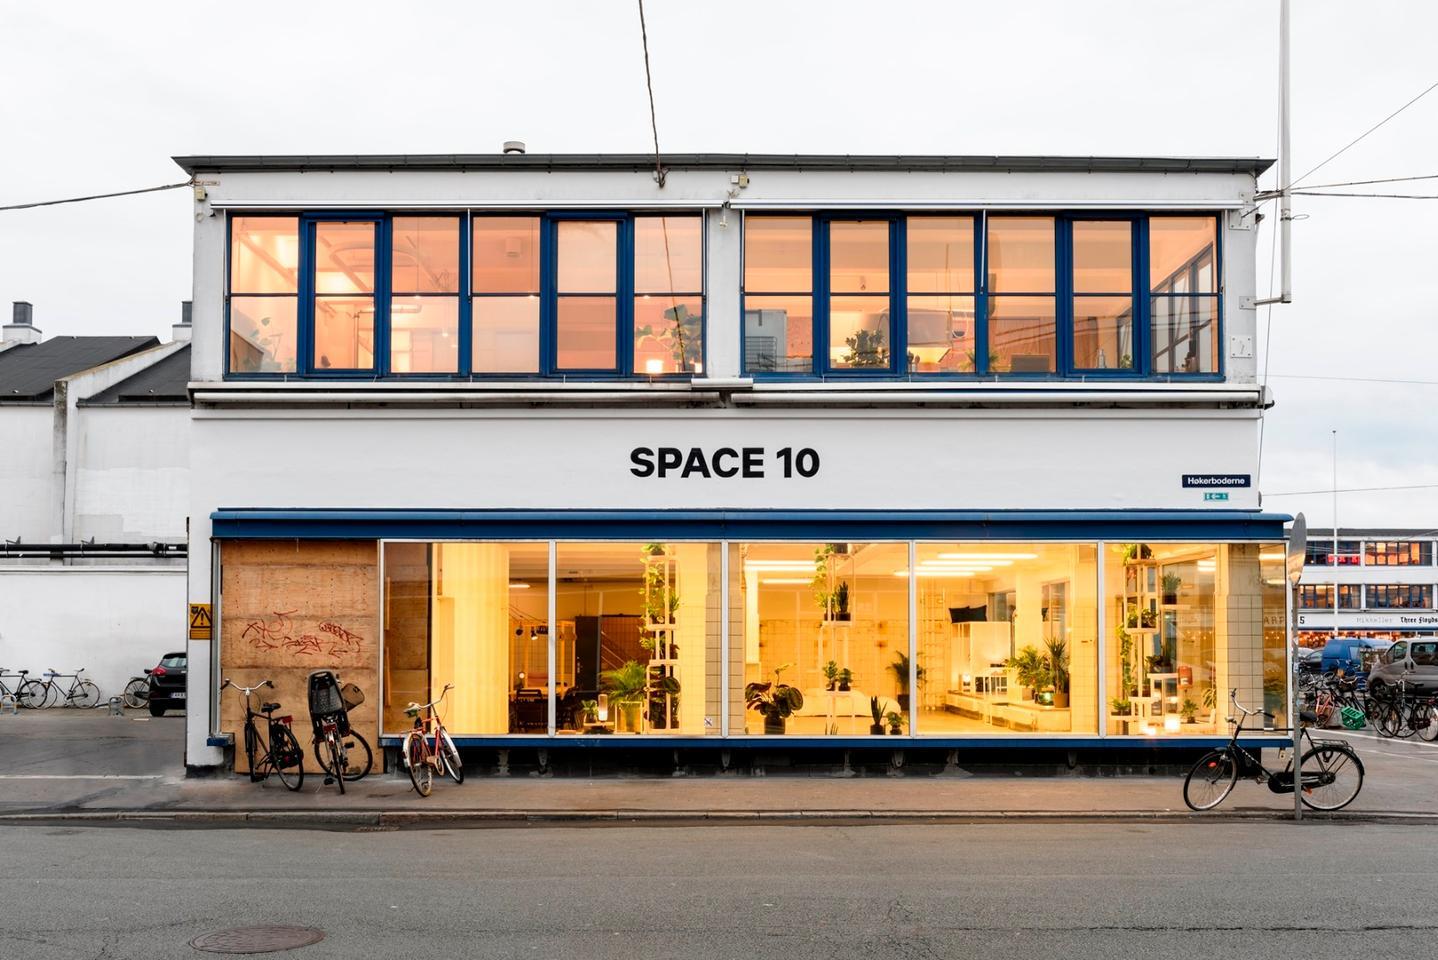 Space10 serves as an external innovation hub for Ikea